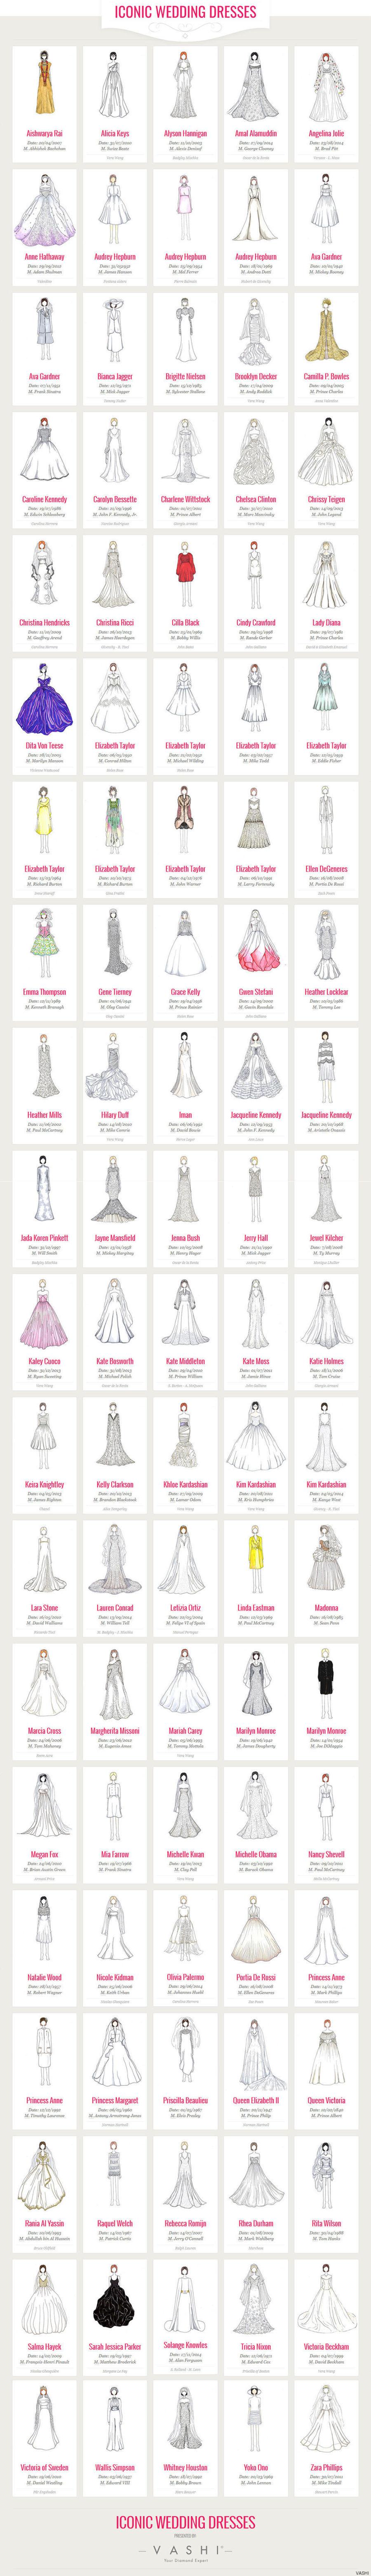 100 mejores vestidos novia